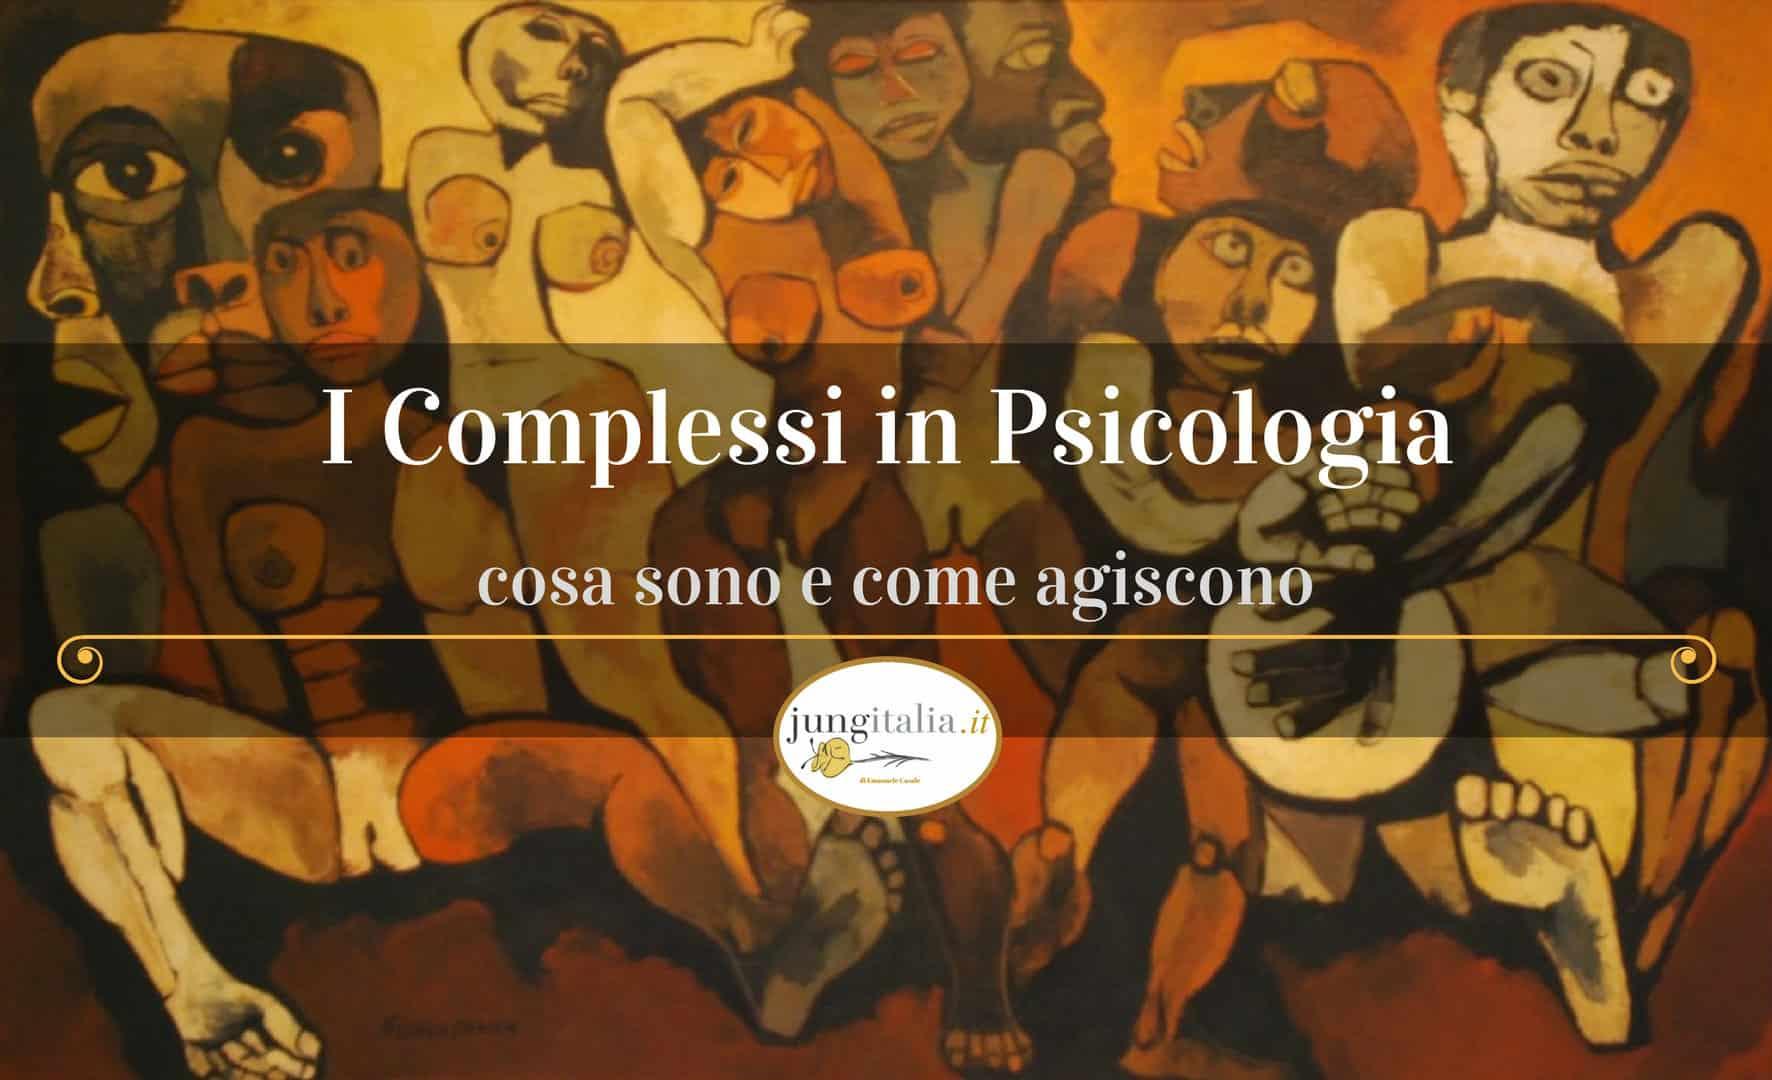 I Complessi in Psicologia